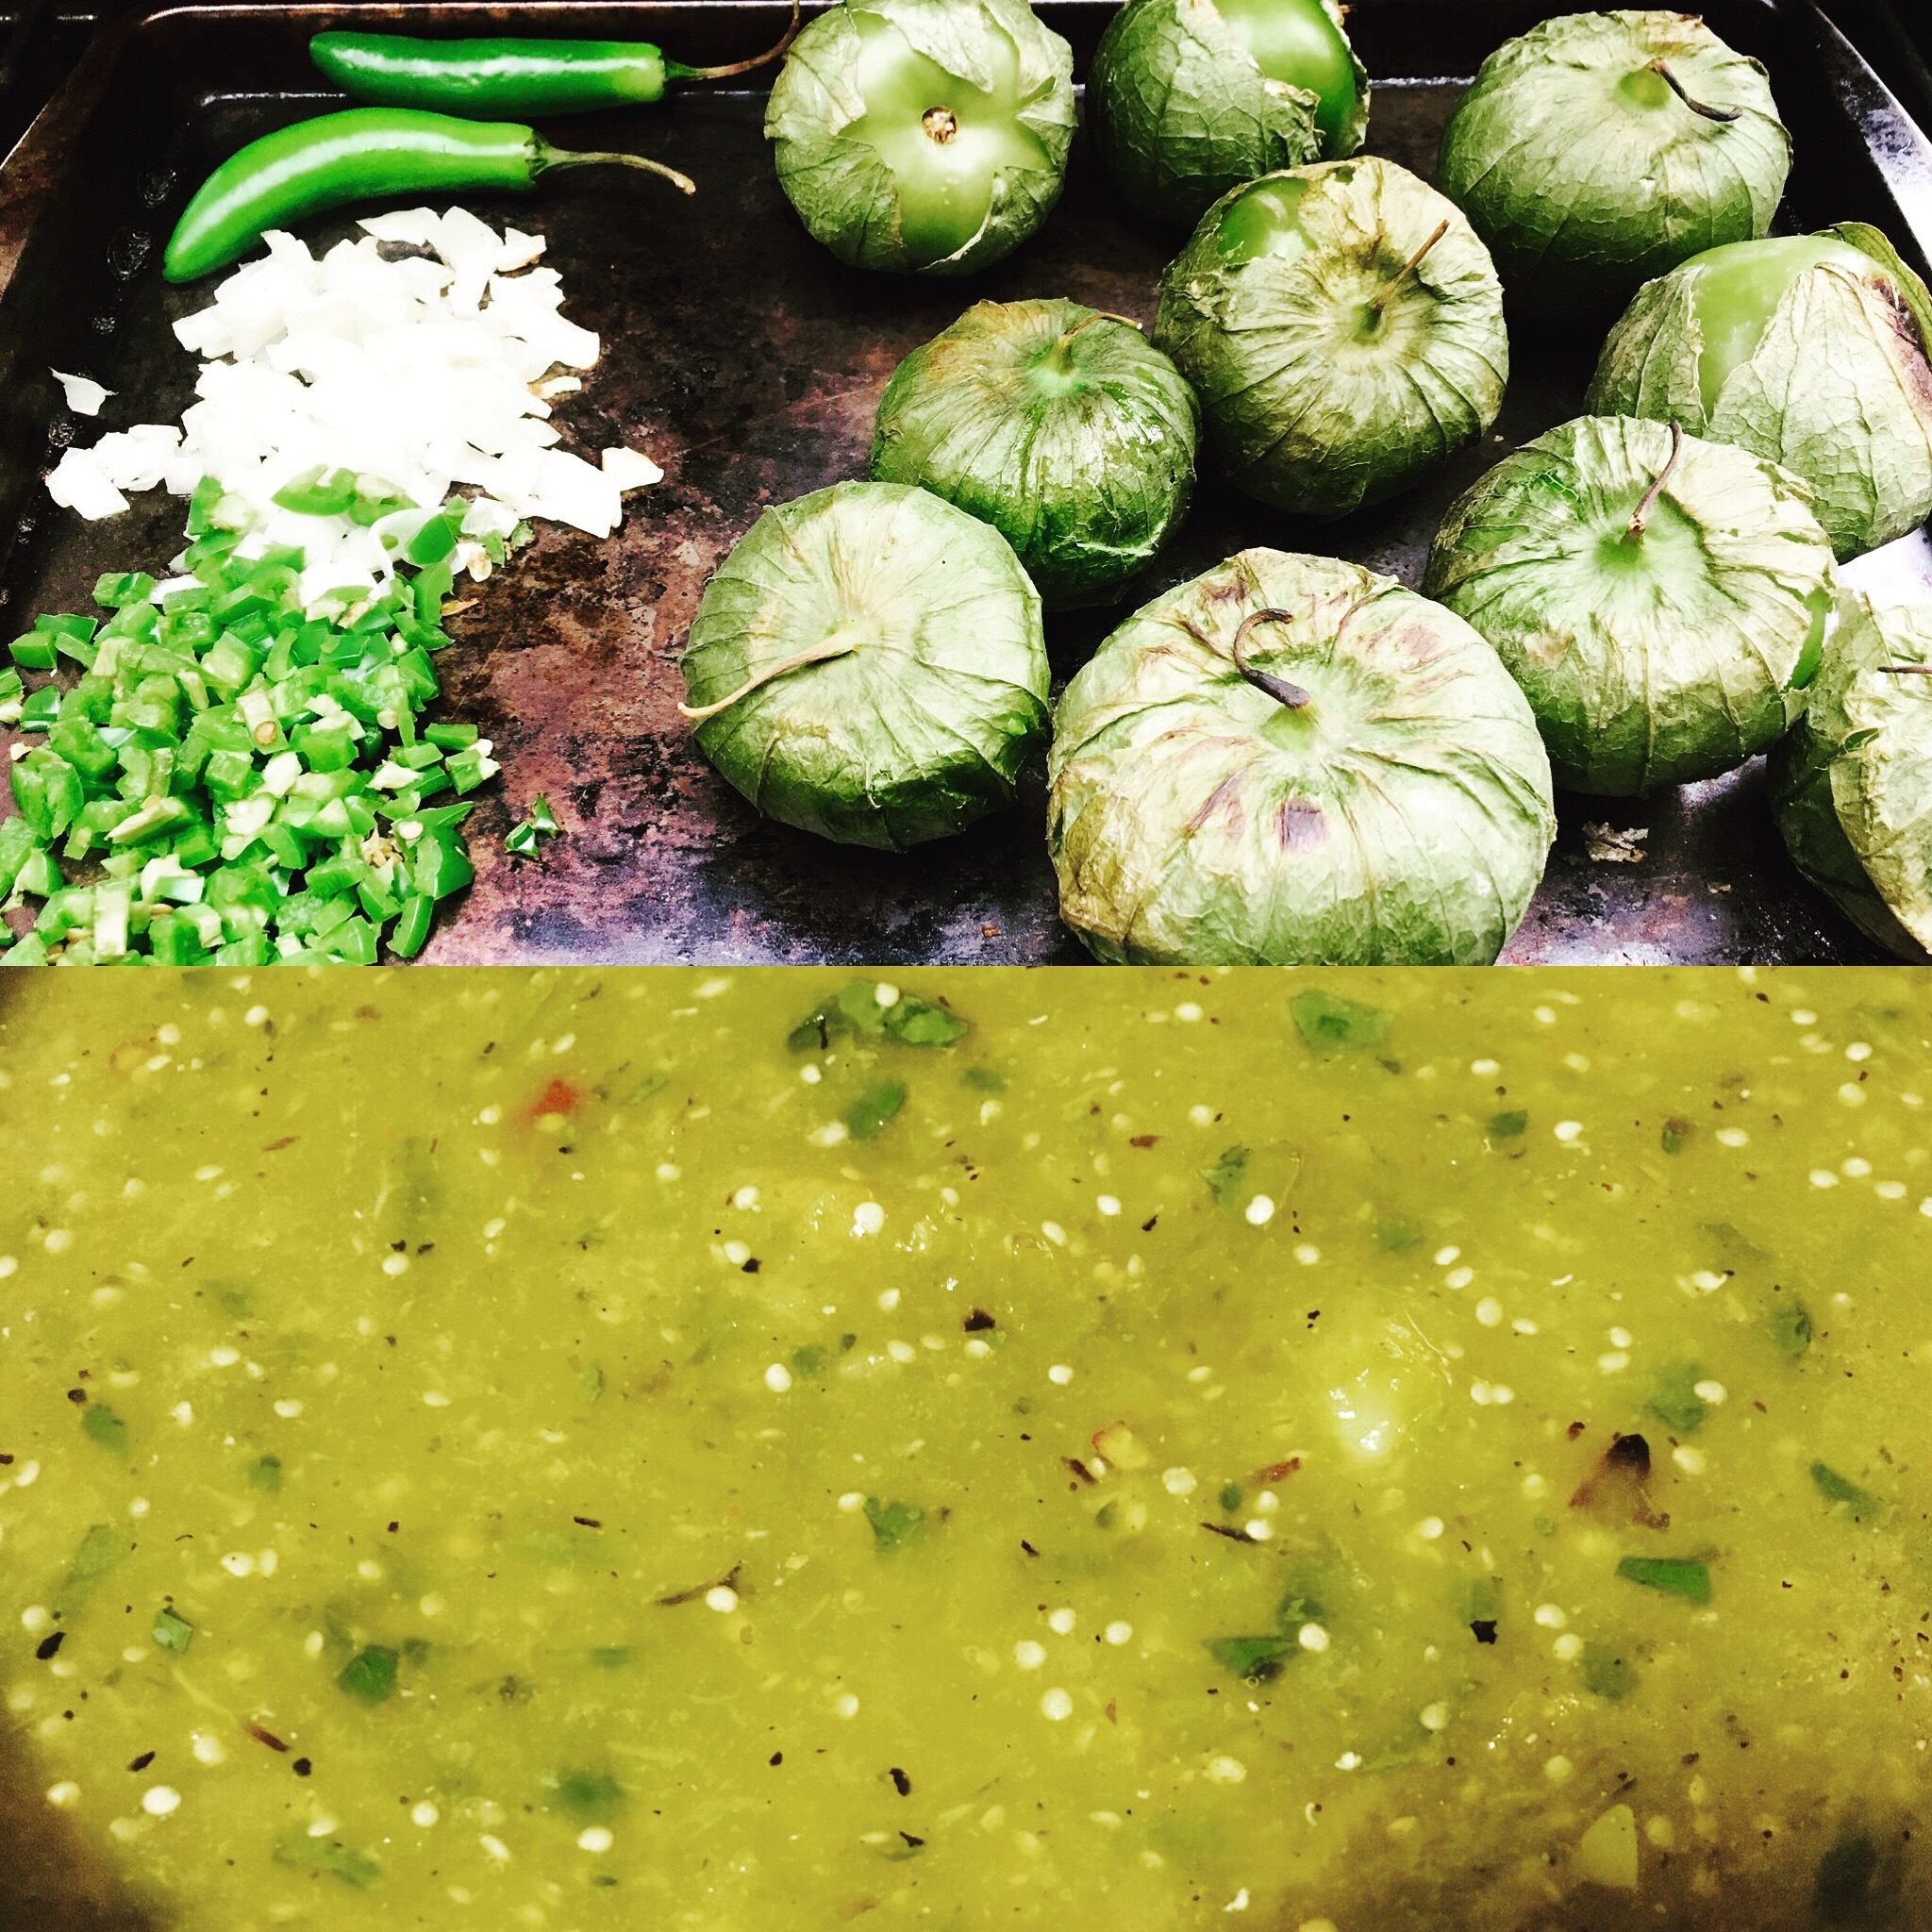 Viva la homemade salsa verde